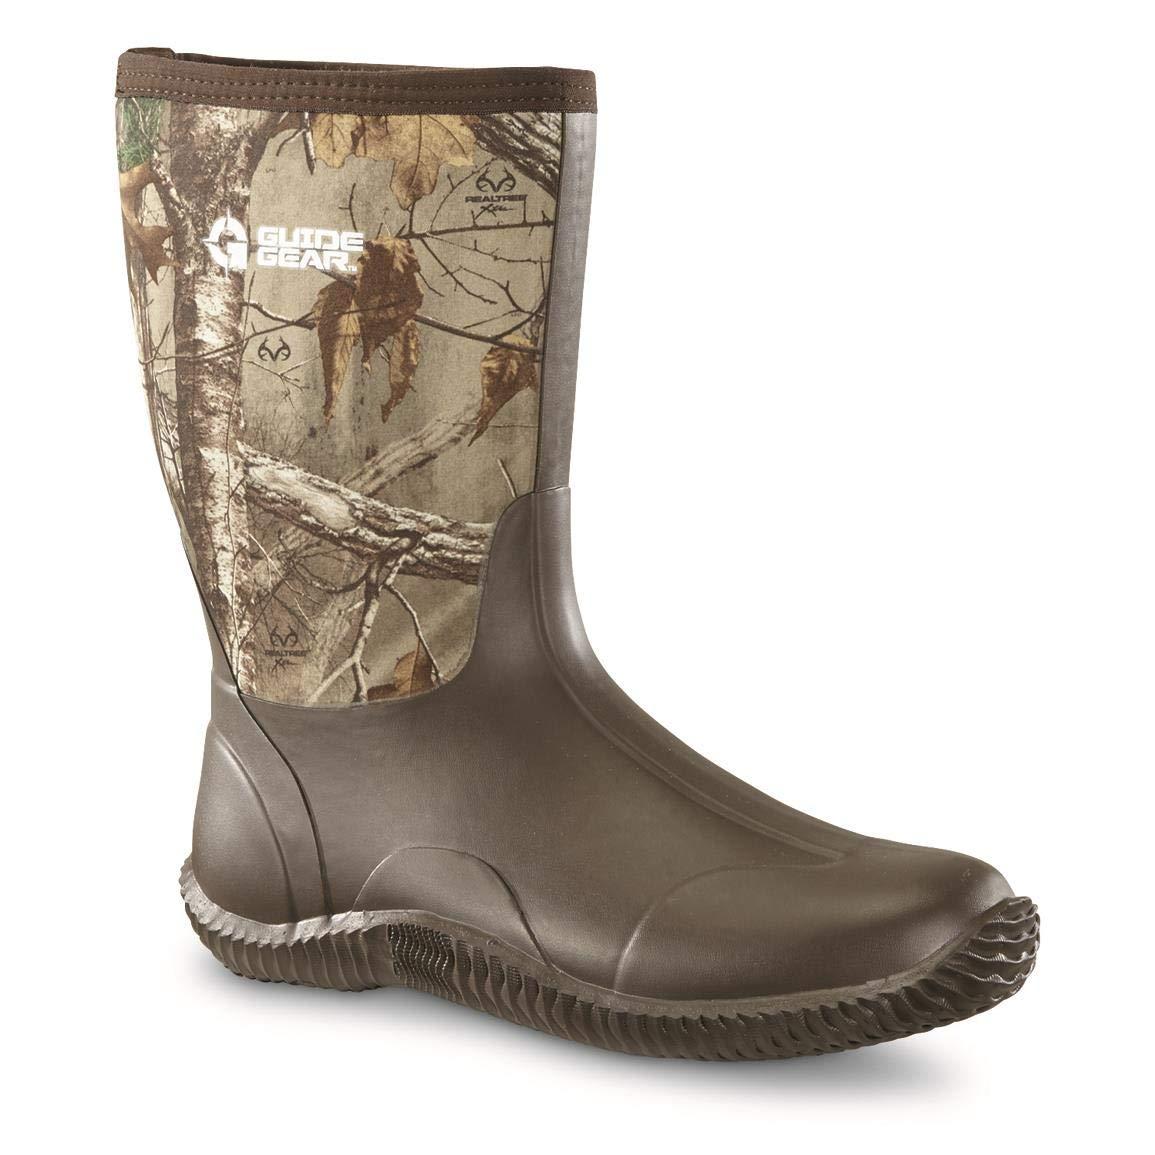 Guide Gear Men's Mid Camo Bogger Rubber Boots